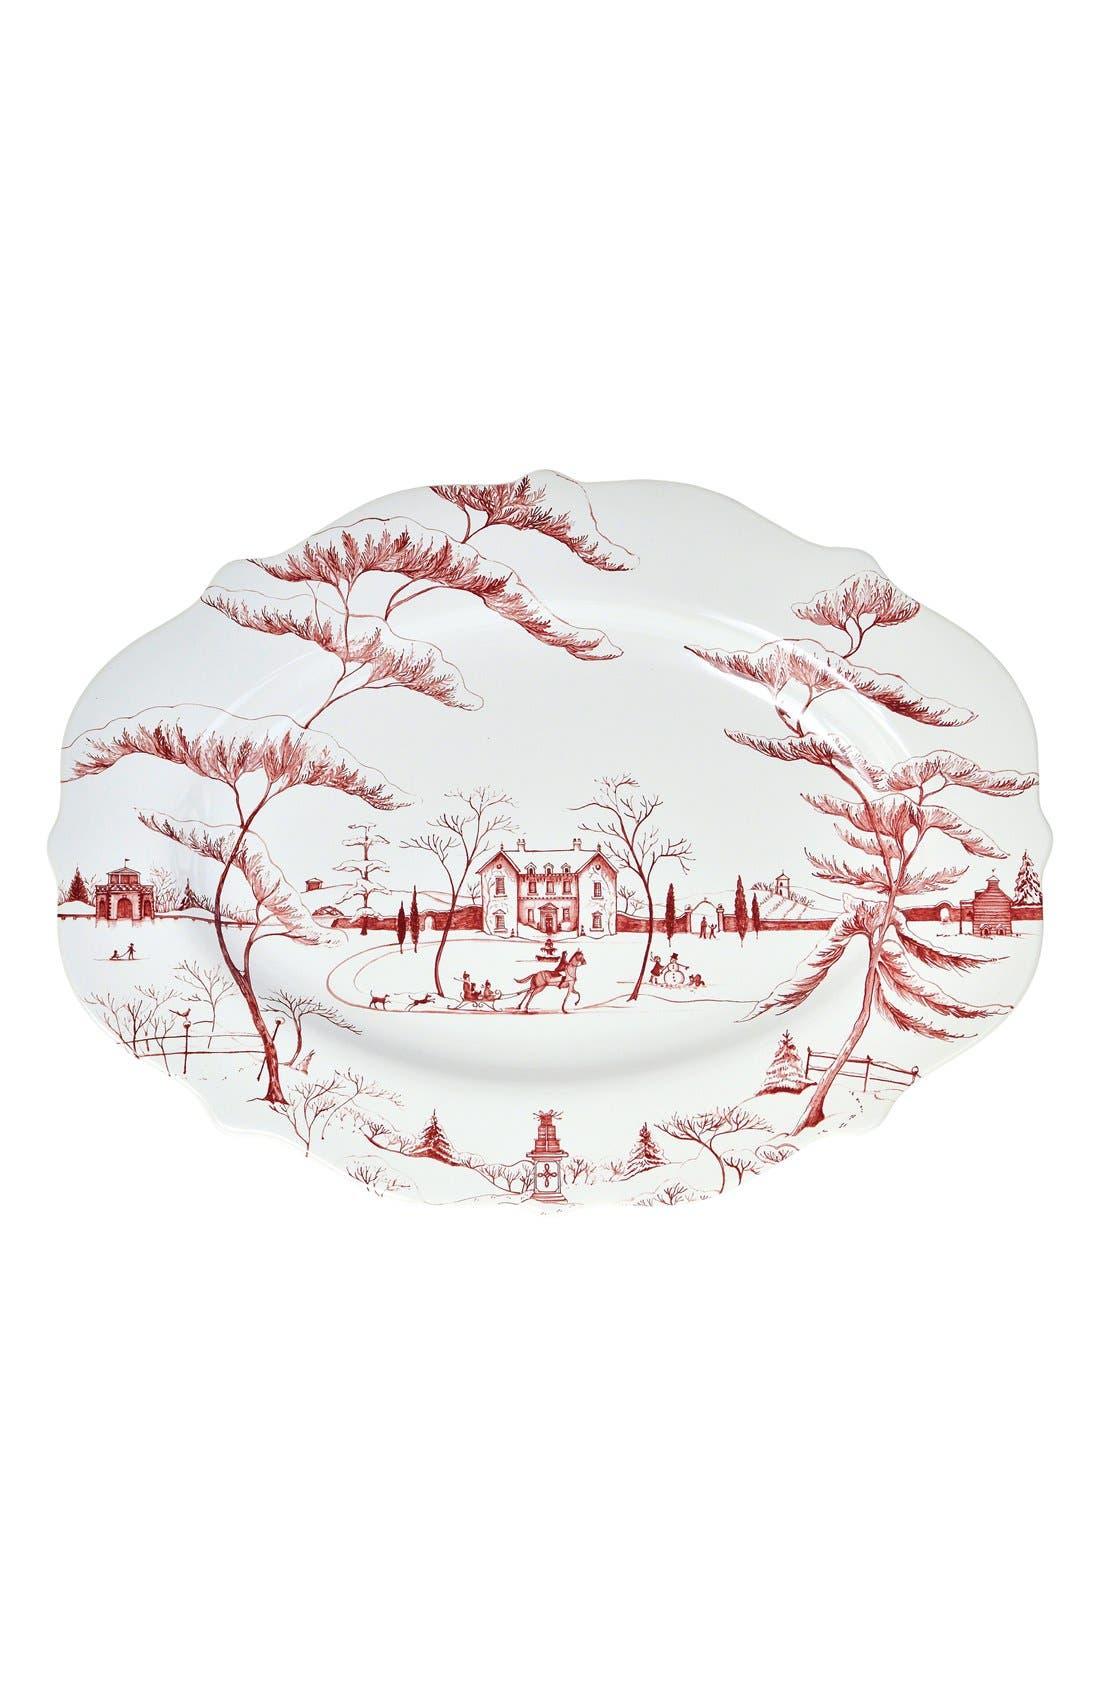 Alternate Image 1 Selected - Juliska 'Country Estate Ruby' Ceramic Serving Platter